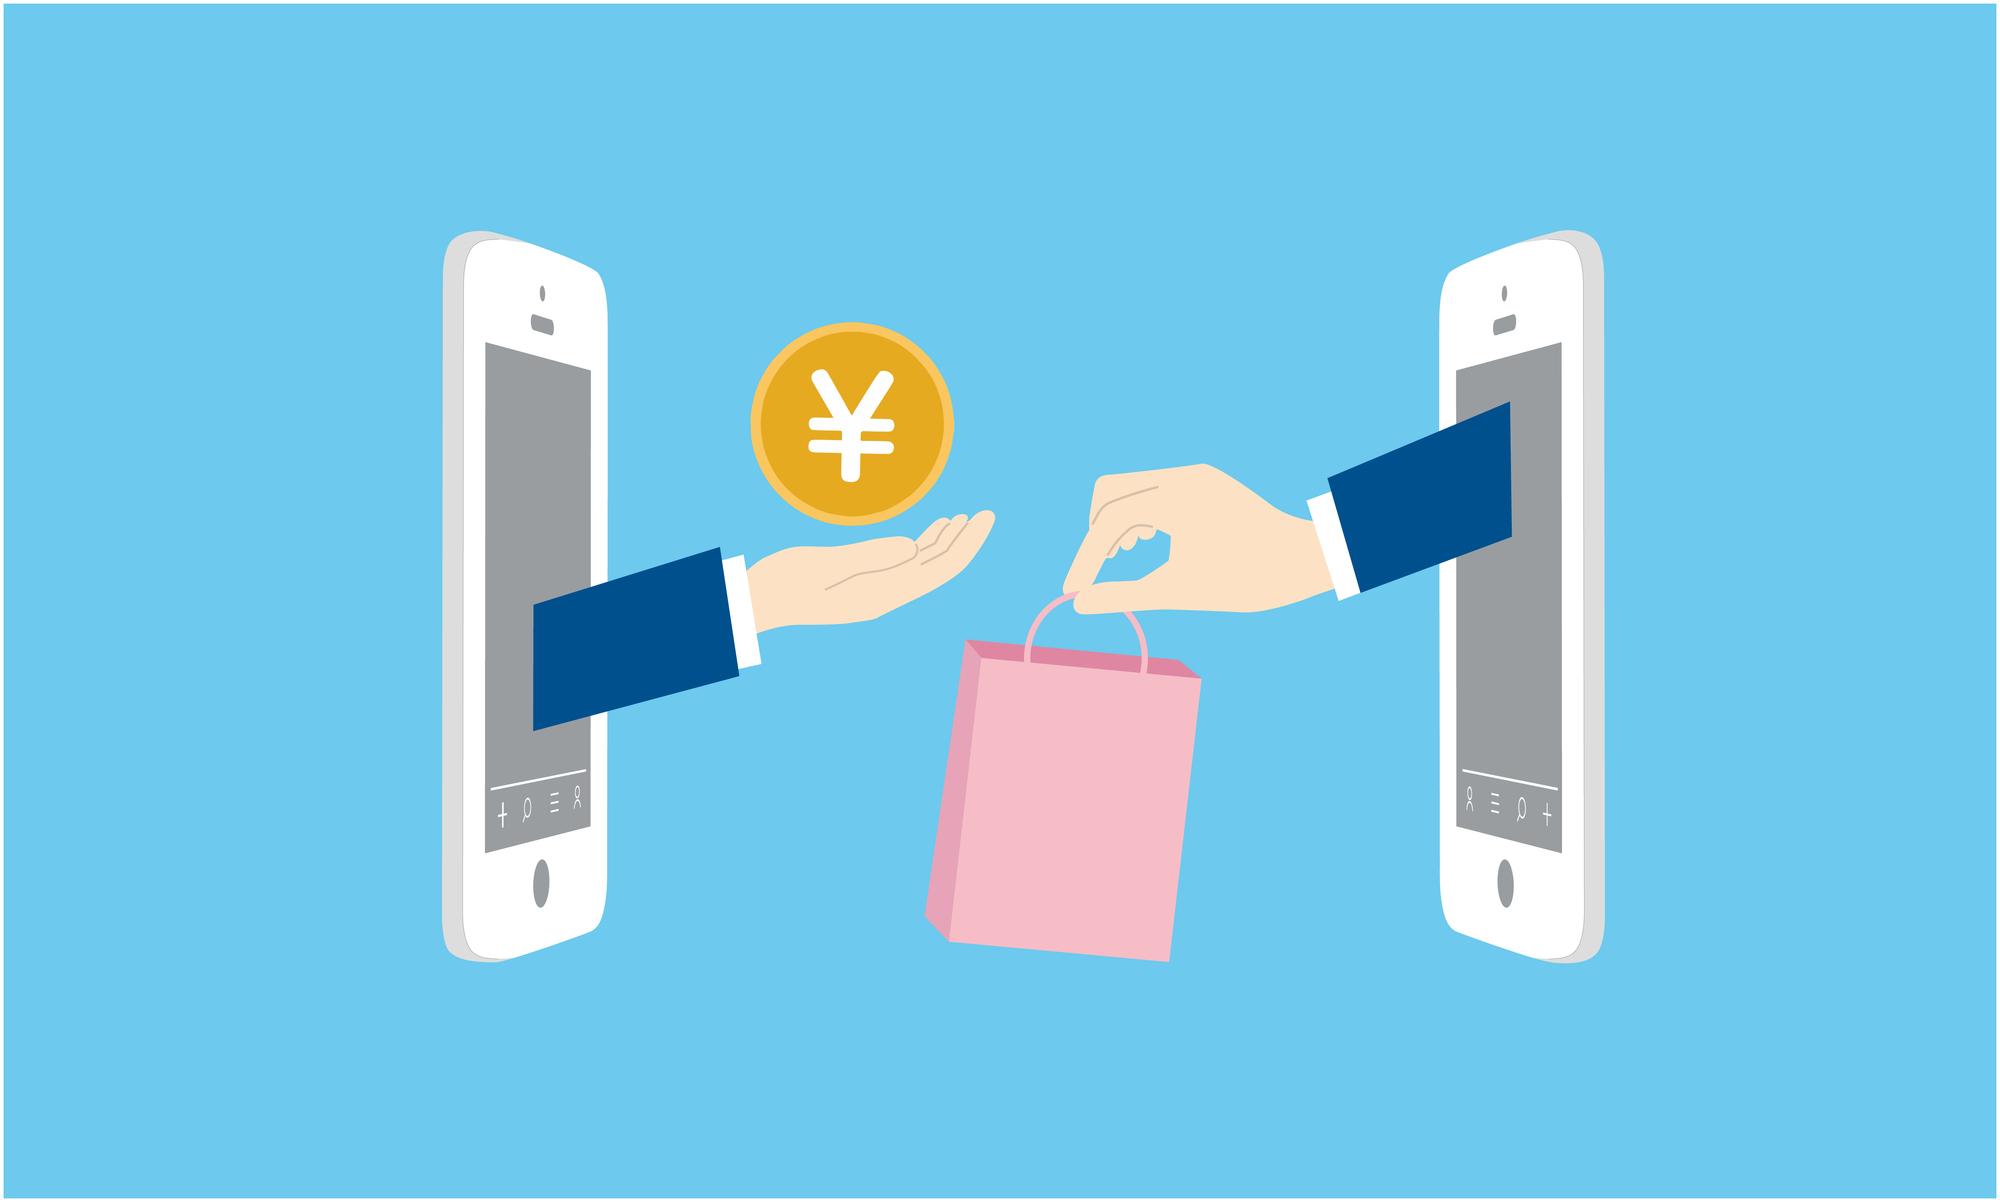 Shopifyは複数のECサイトを一元的に管理することが可能